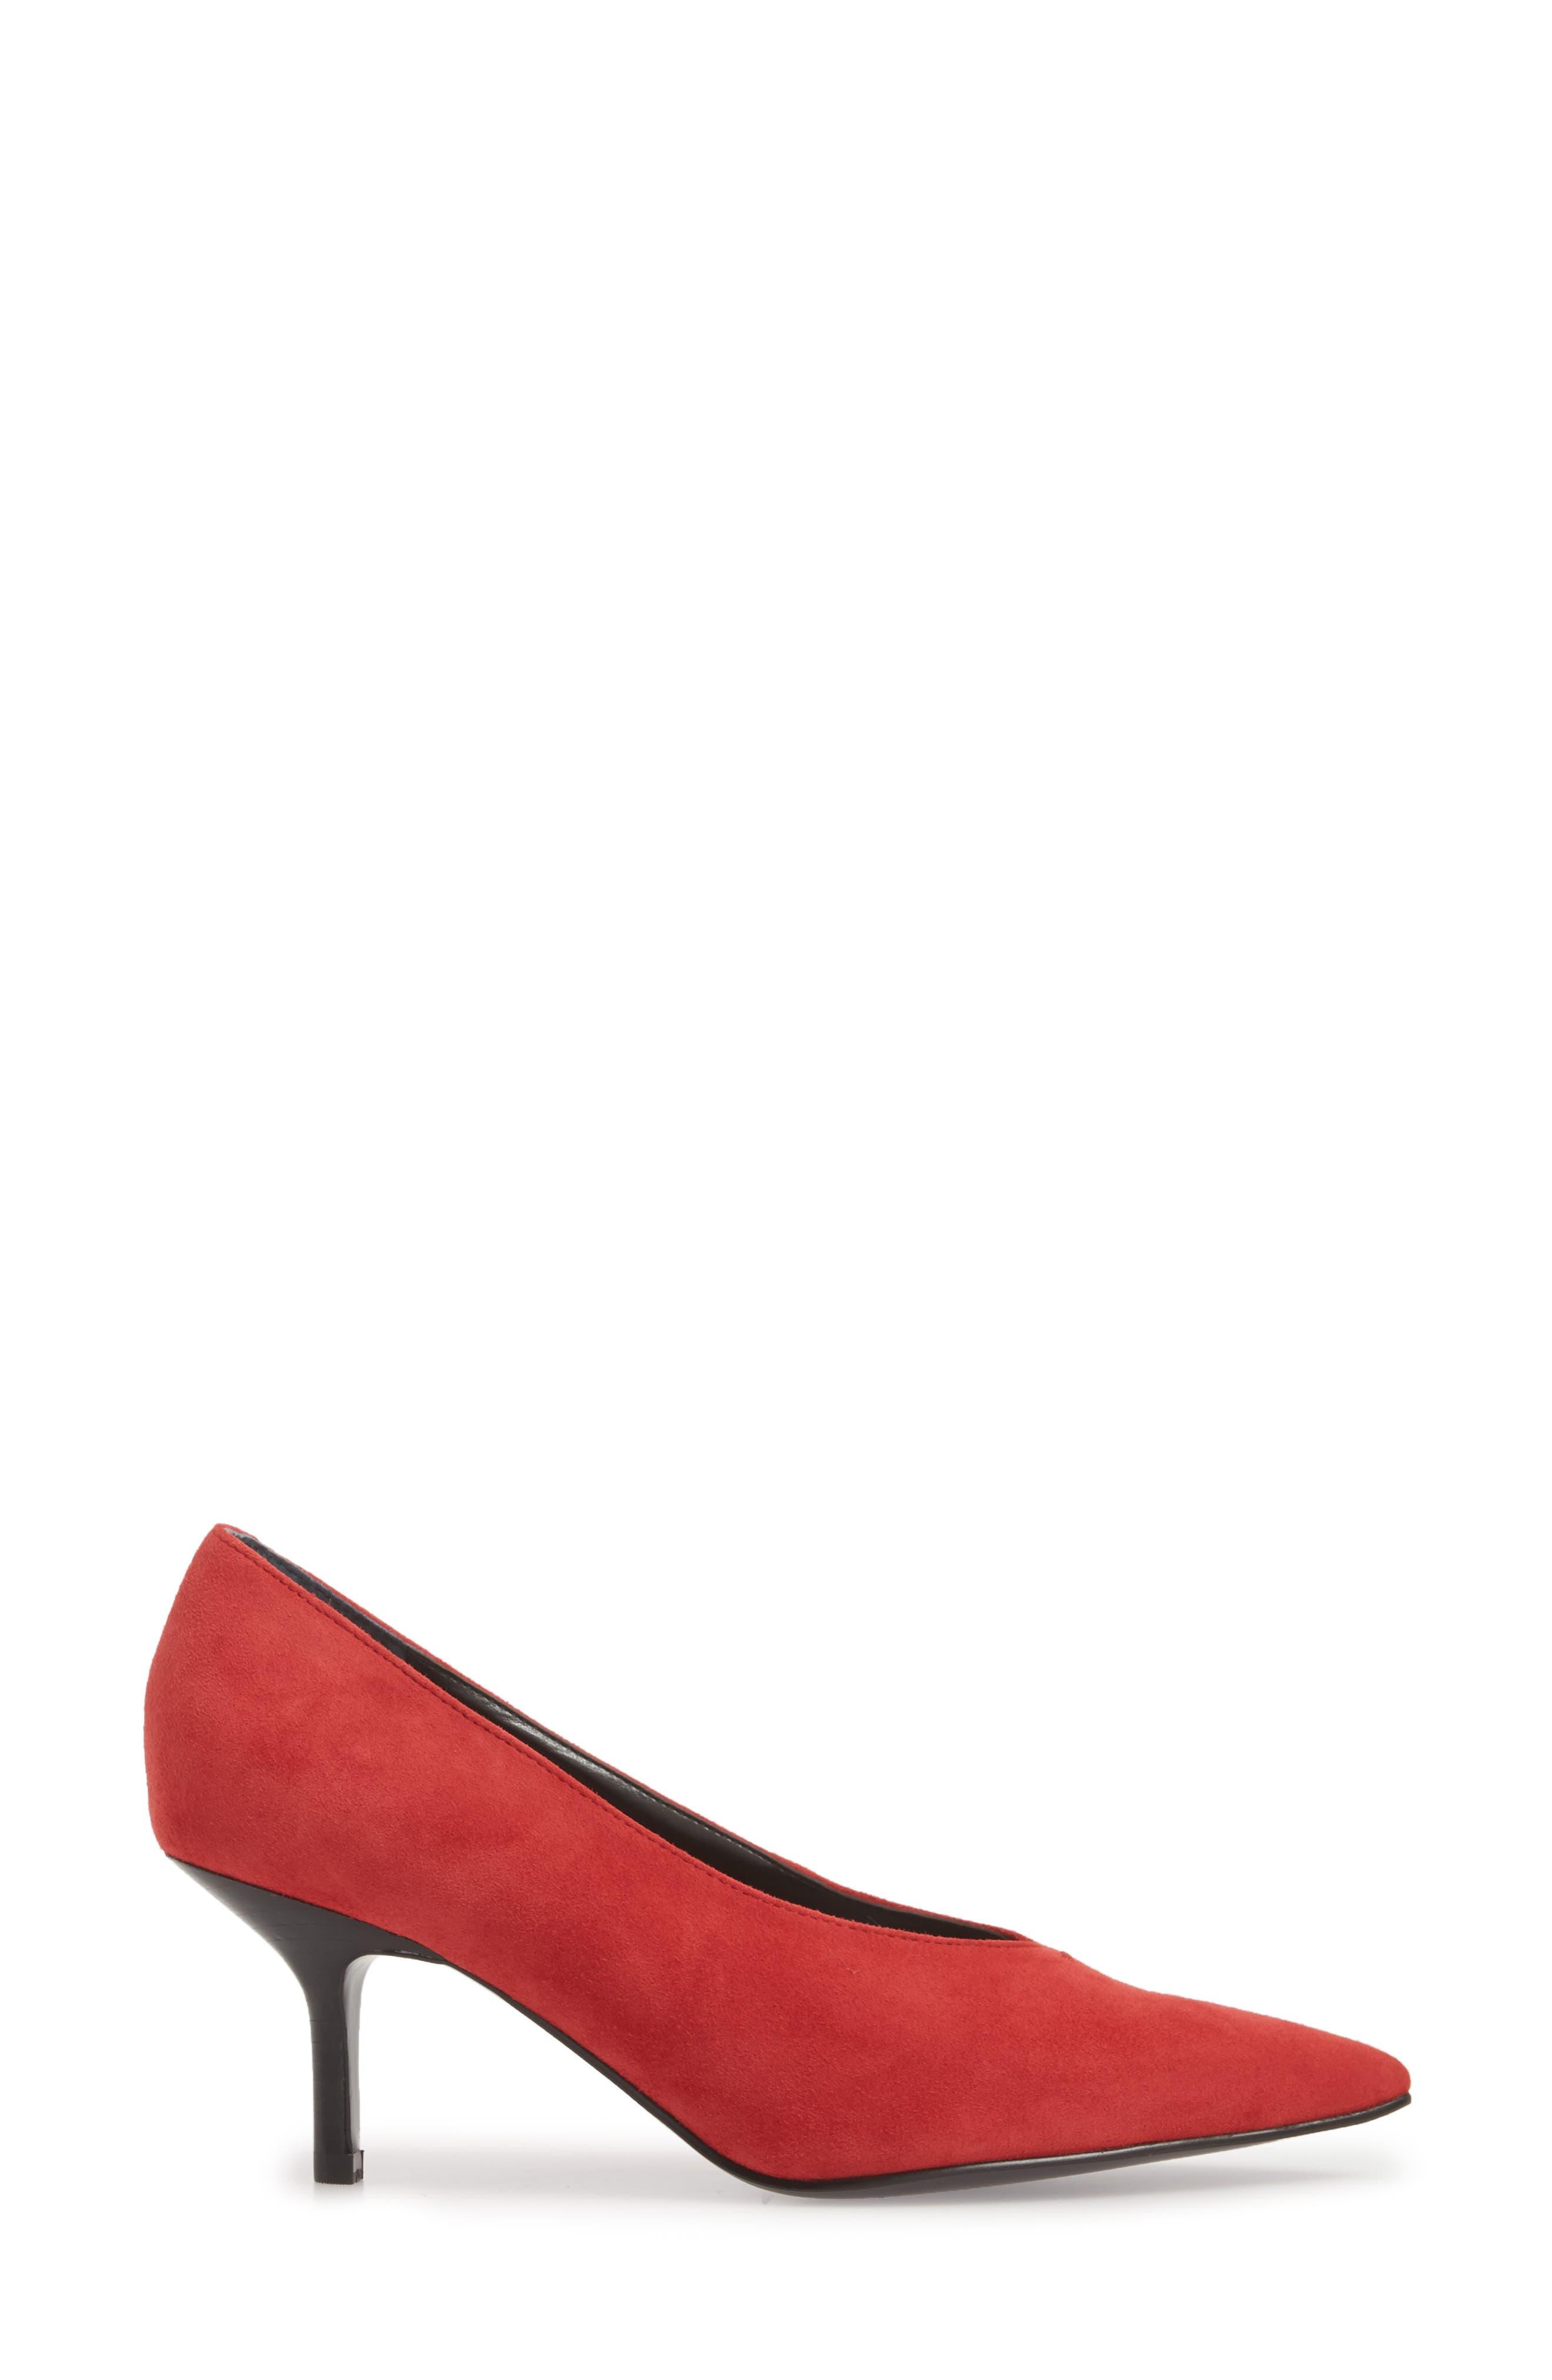 Dallon Kitten Heel Pump,                             Alternate thumbnail 3, color,                             Red Suede